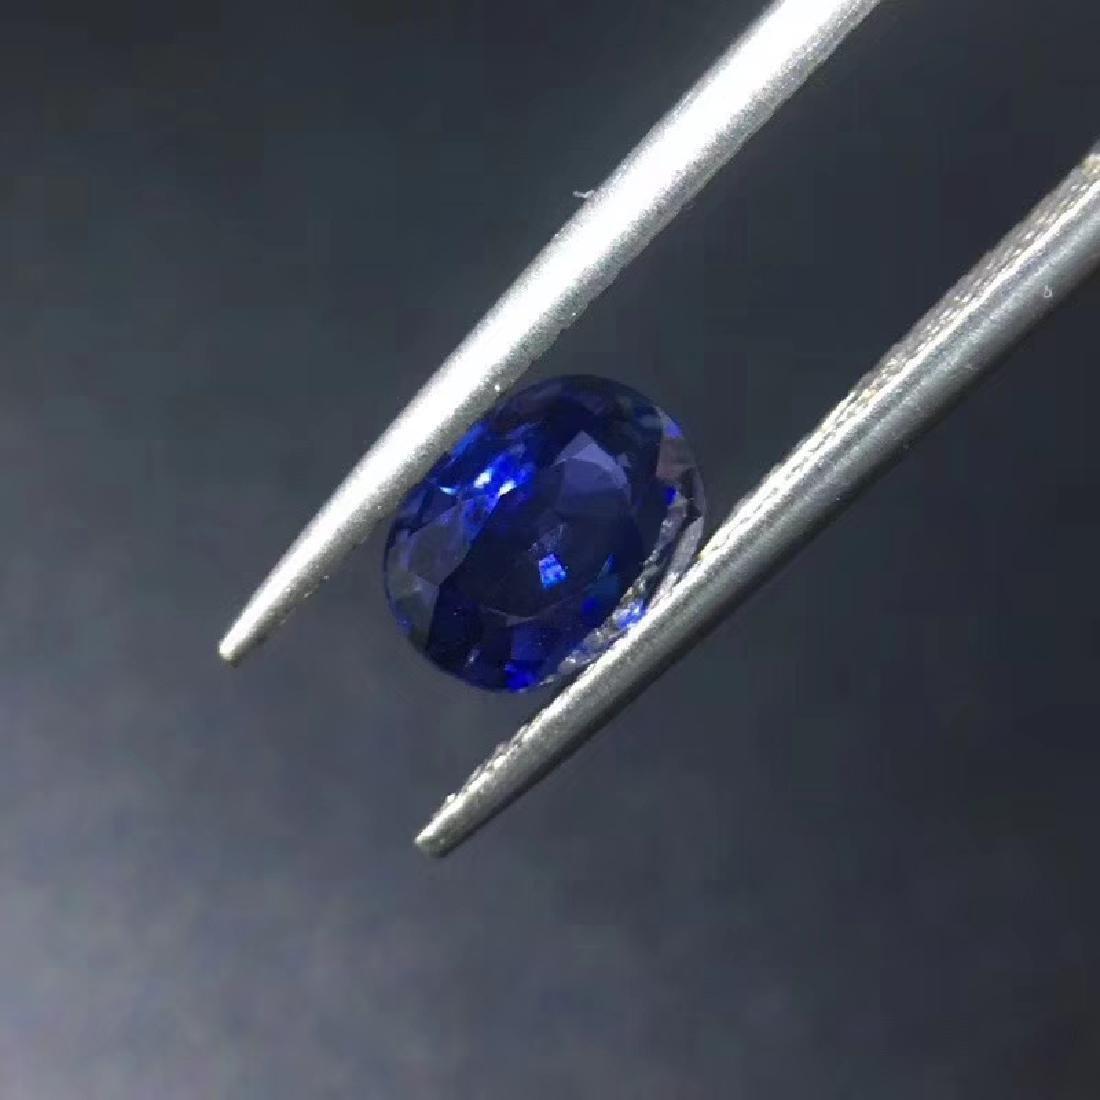 1.07 ct Sapphire 5.3*7.0*3.0 mm Oval Cut - 3